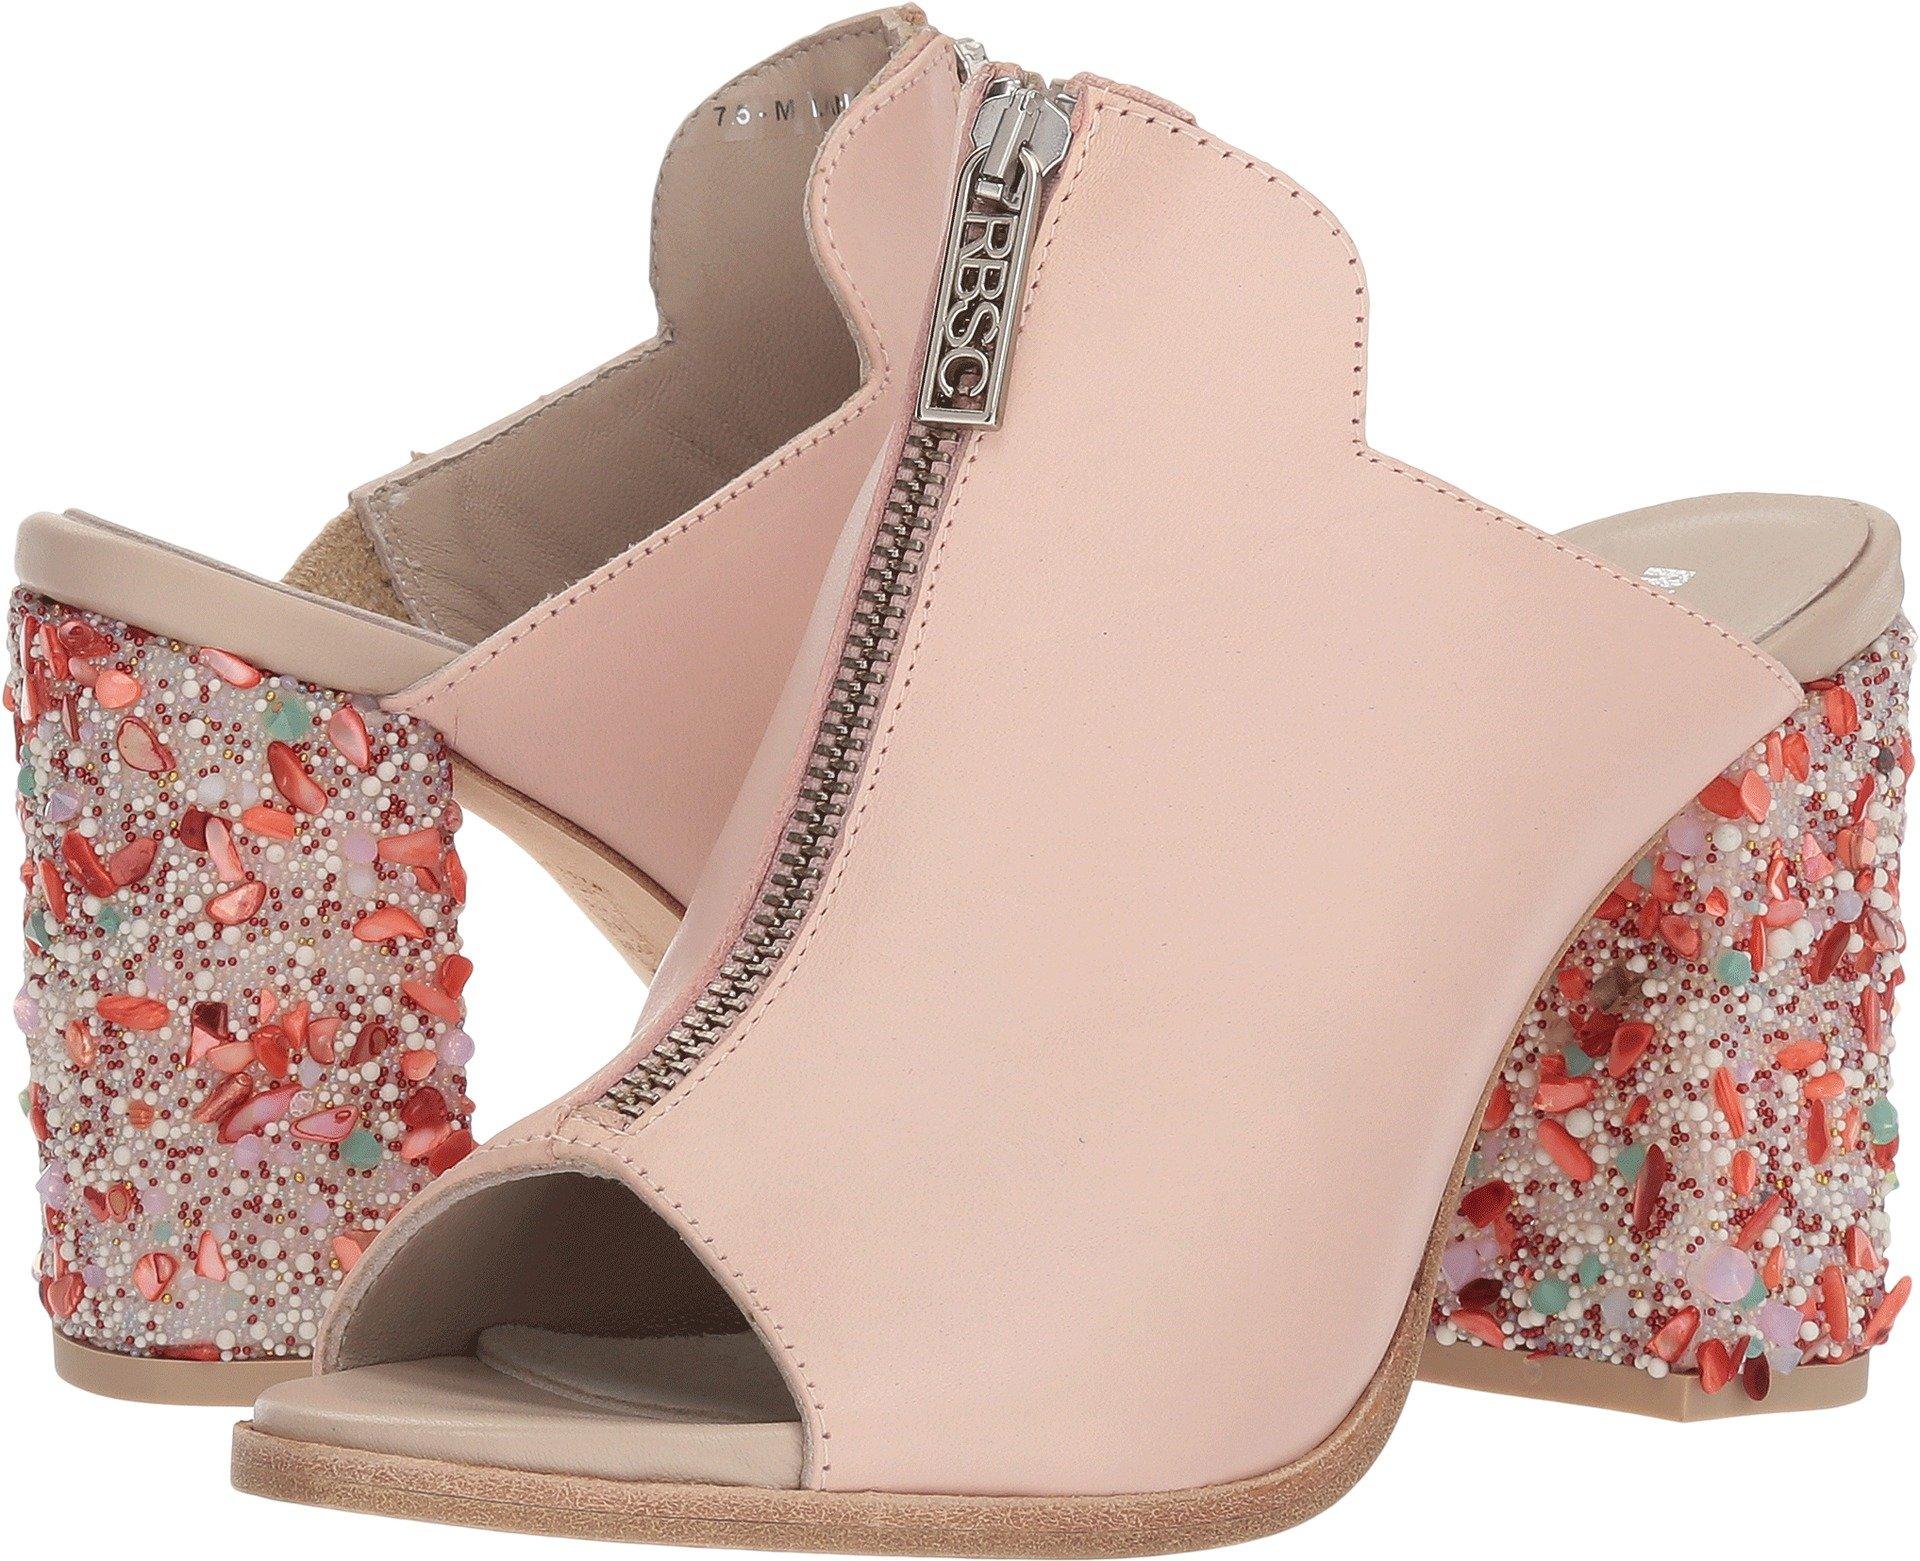 Right Bank Shoe Co¿ Women's Lana Heel Nude 7.5 M US